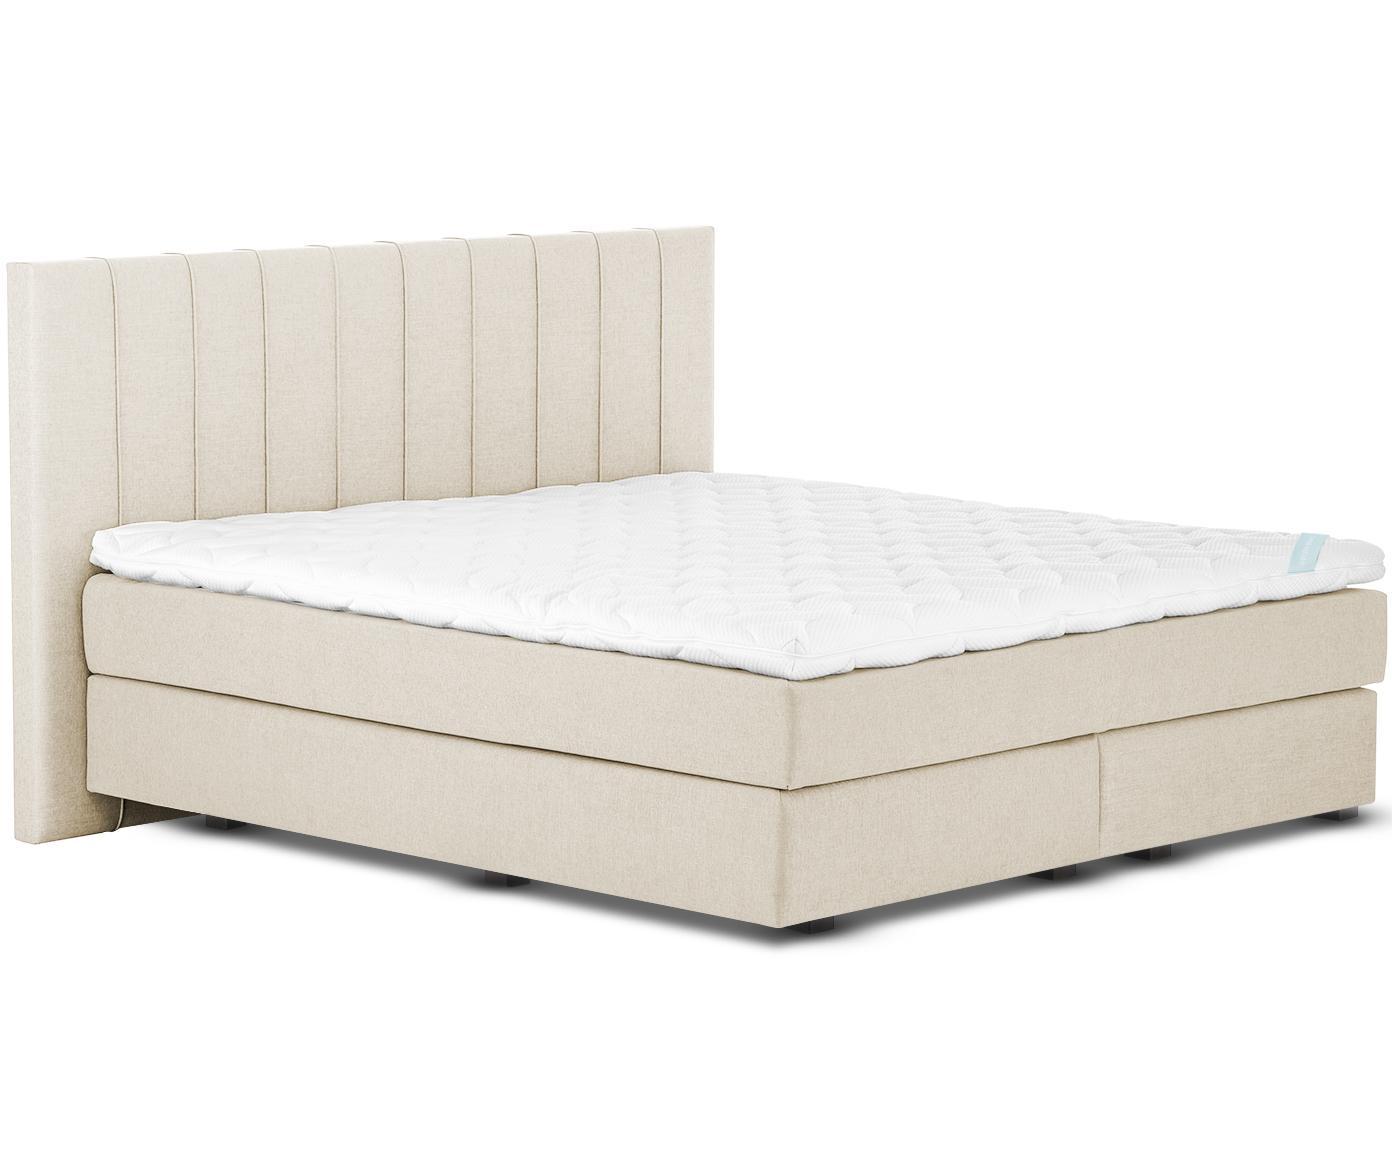 Premium boxspring bed Lacey, Matras: 7-zones-pocketveringkern , Poten: gelakt massief beukenhout, Beige, 200 x 200 cm